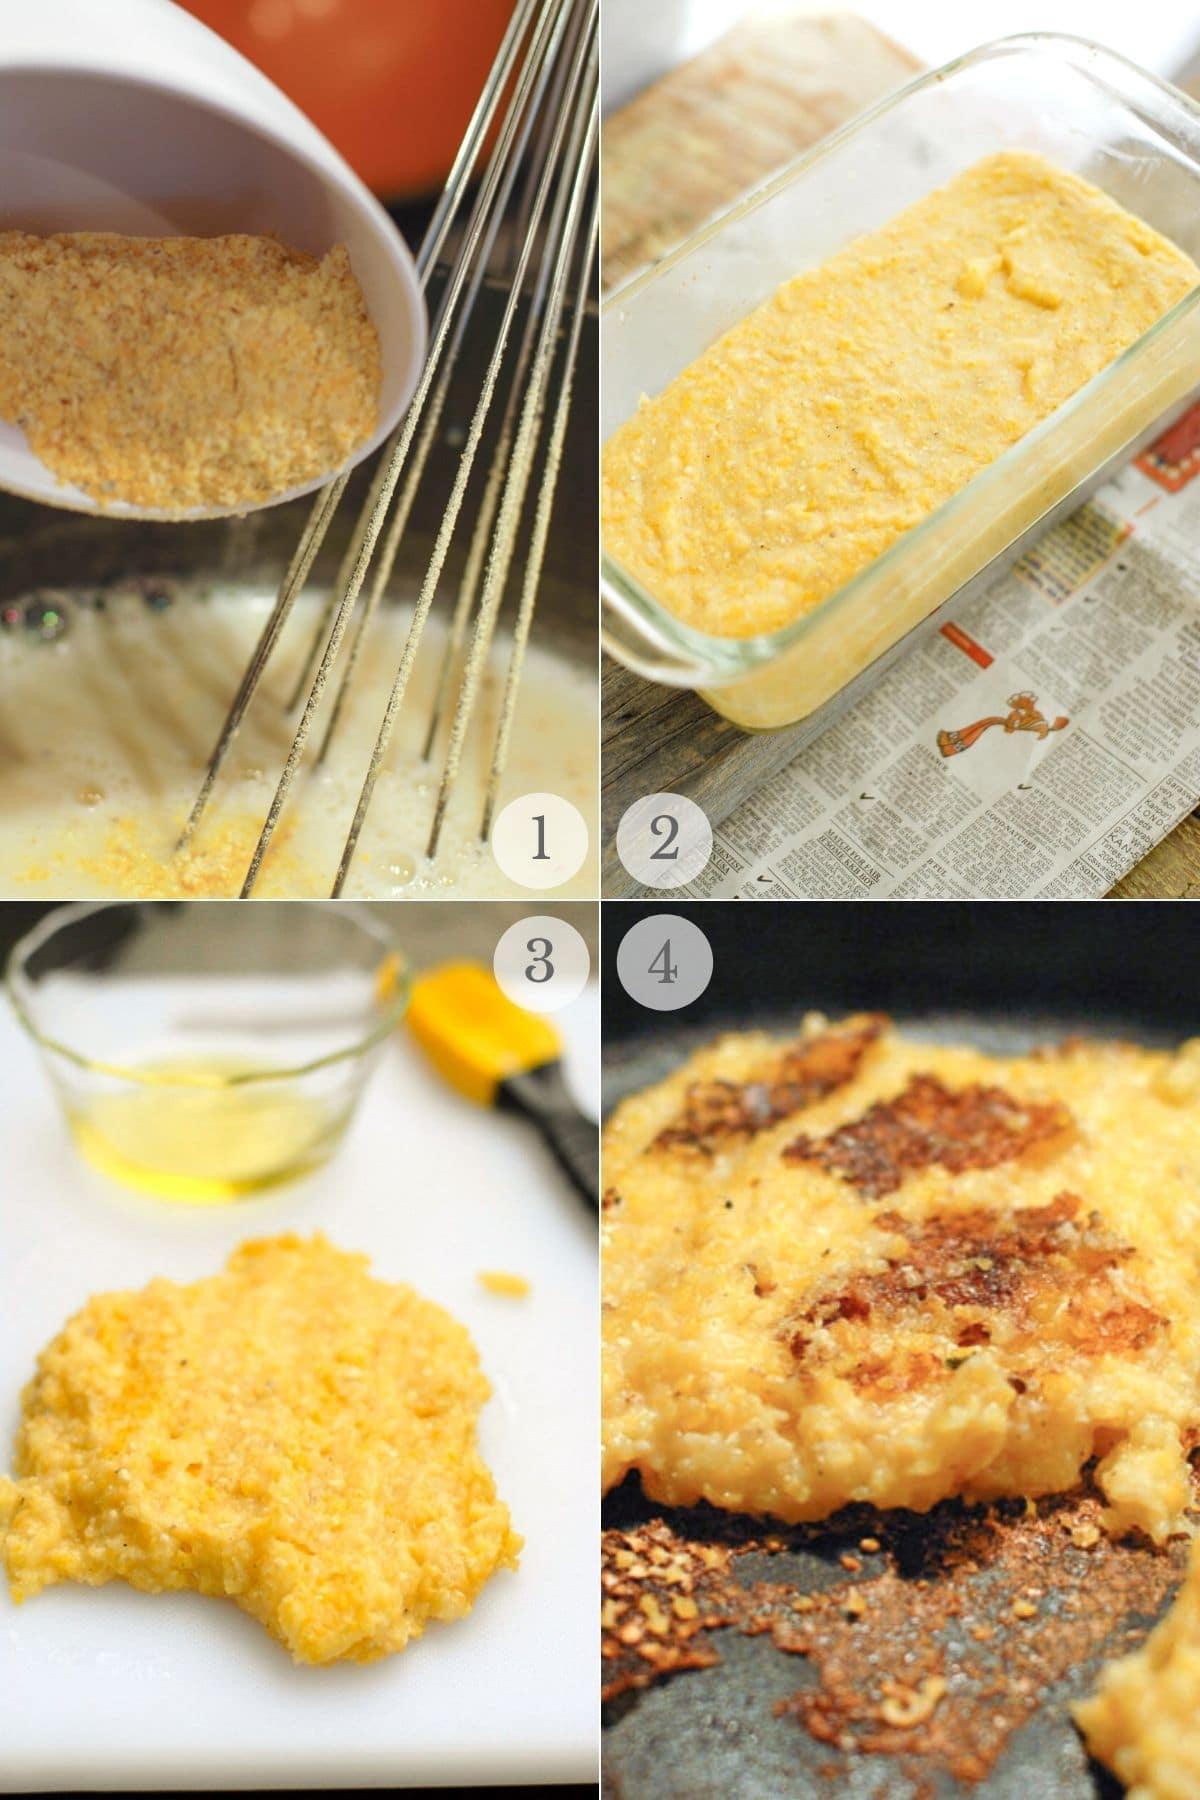 pan fried polenta and greens recipe steps 1-4